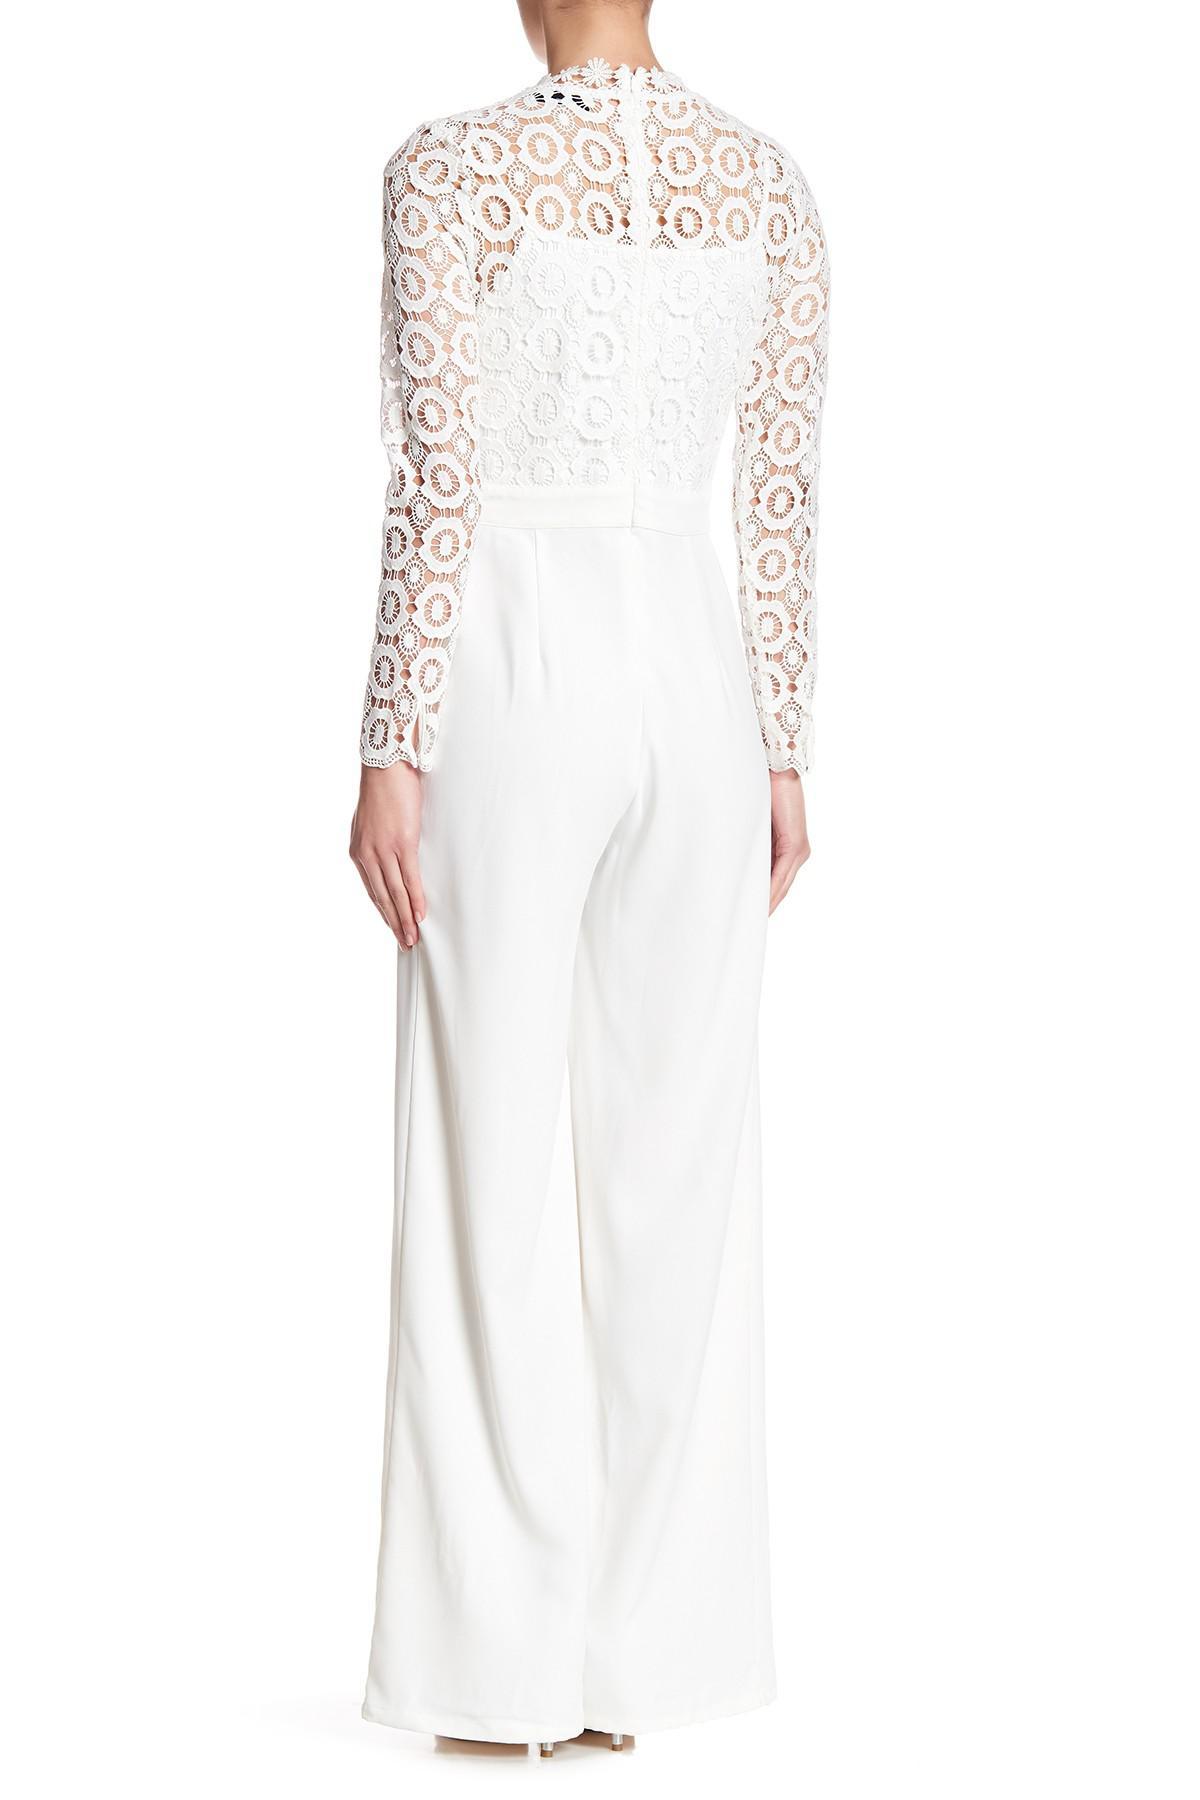 e1330ddcb16 Lyst - Sugarlips Ariella Crochet Jumpsuit in White